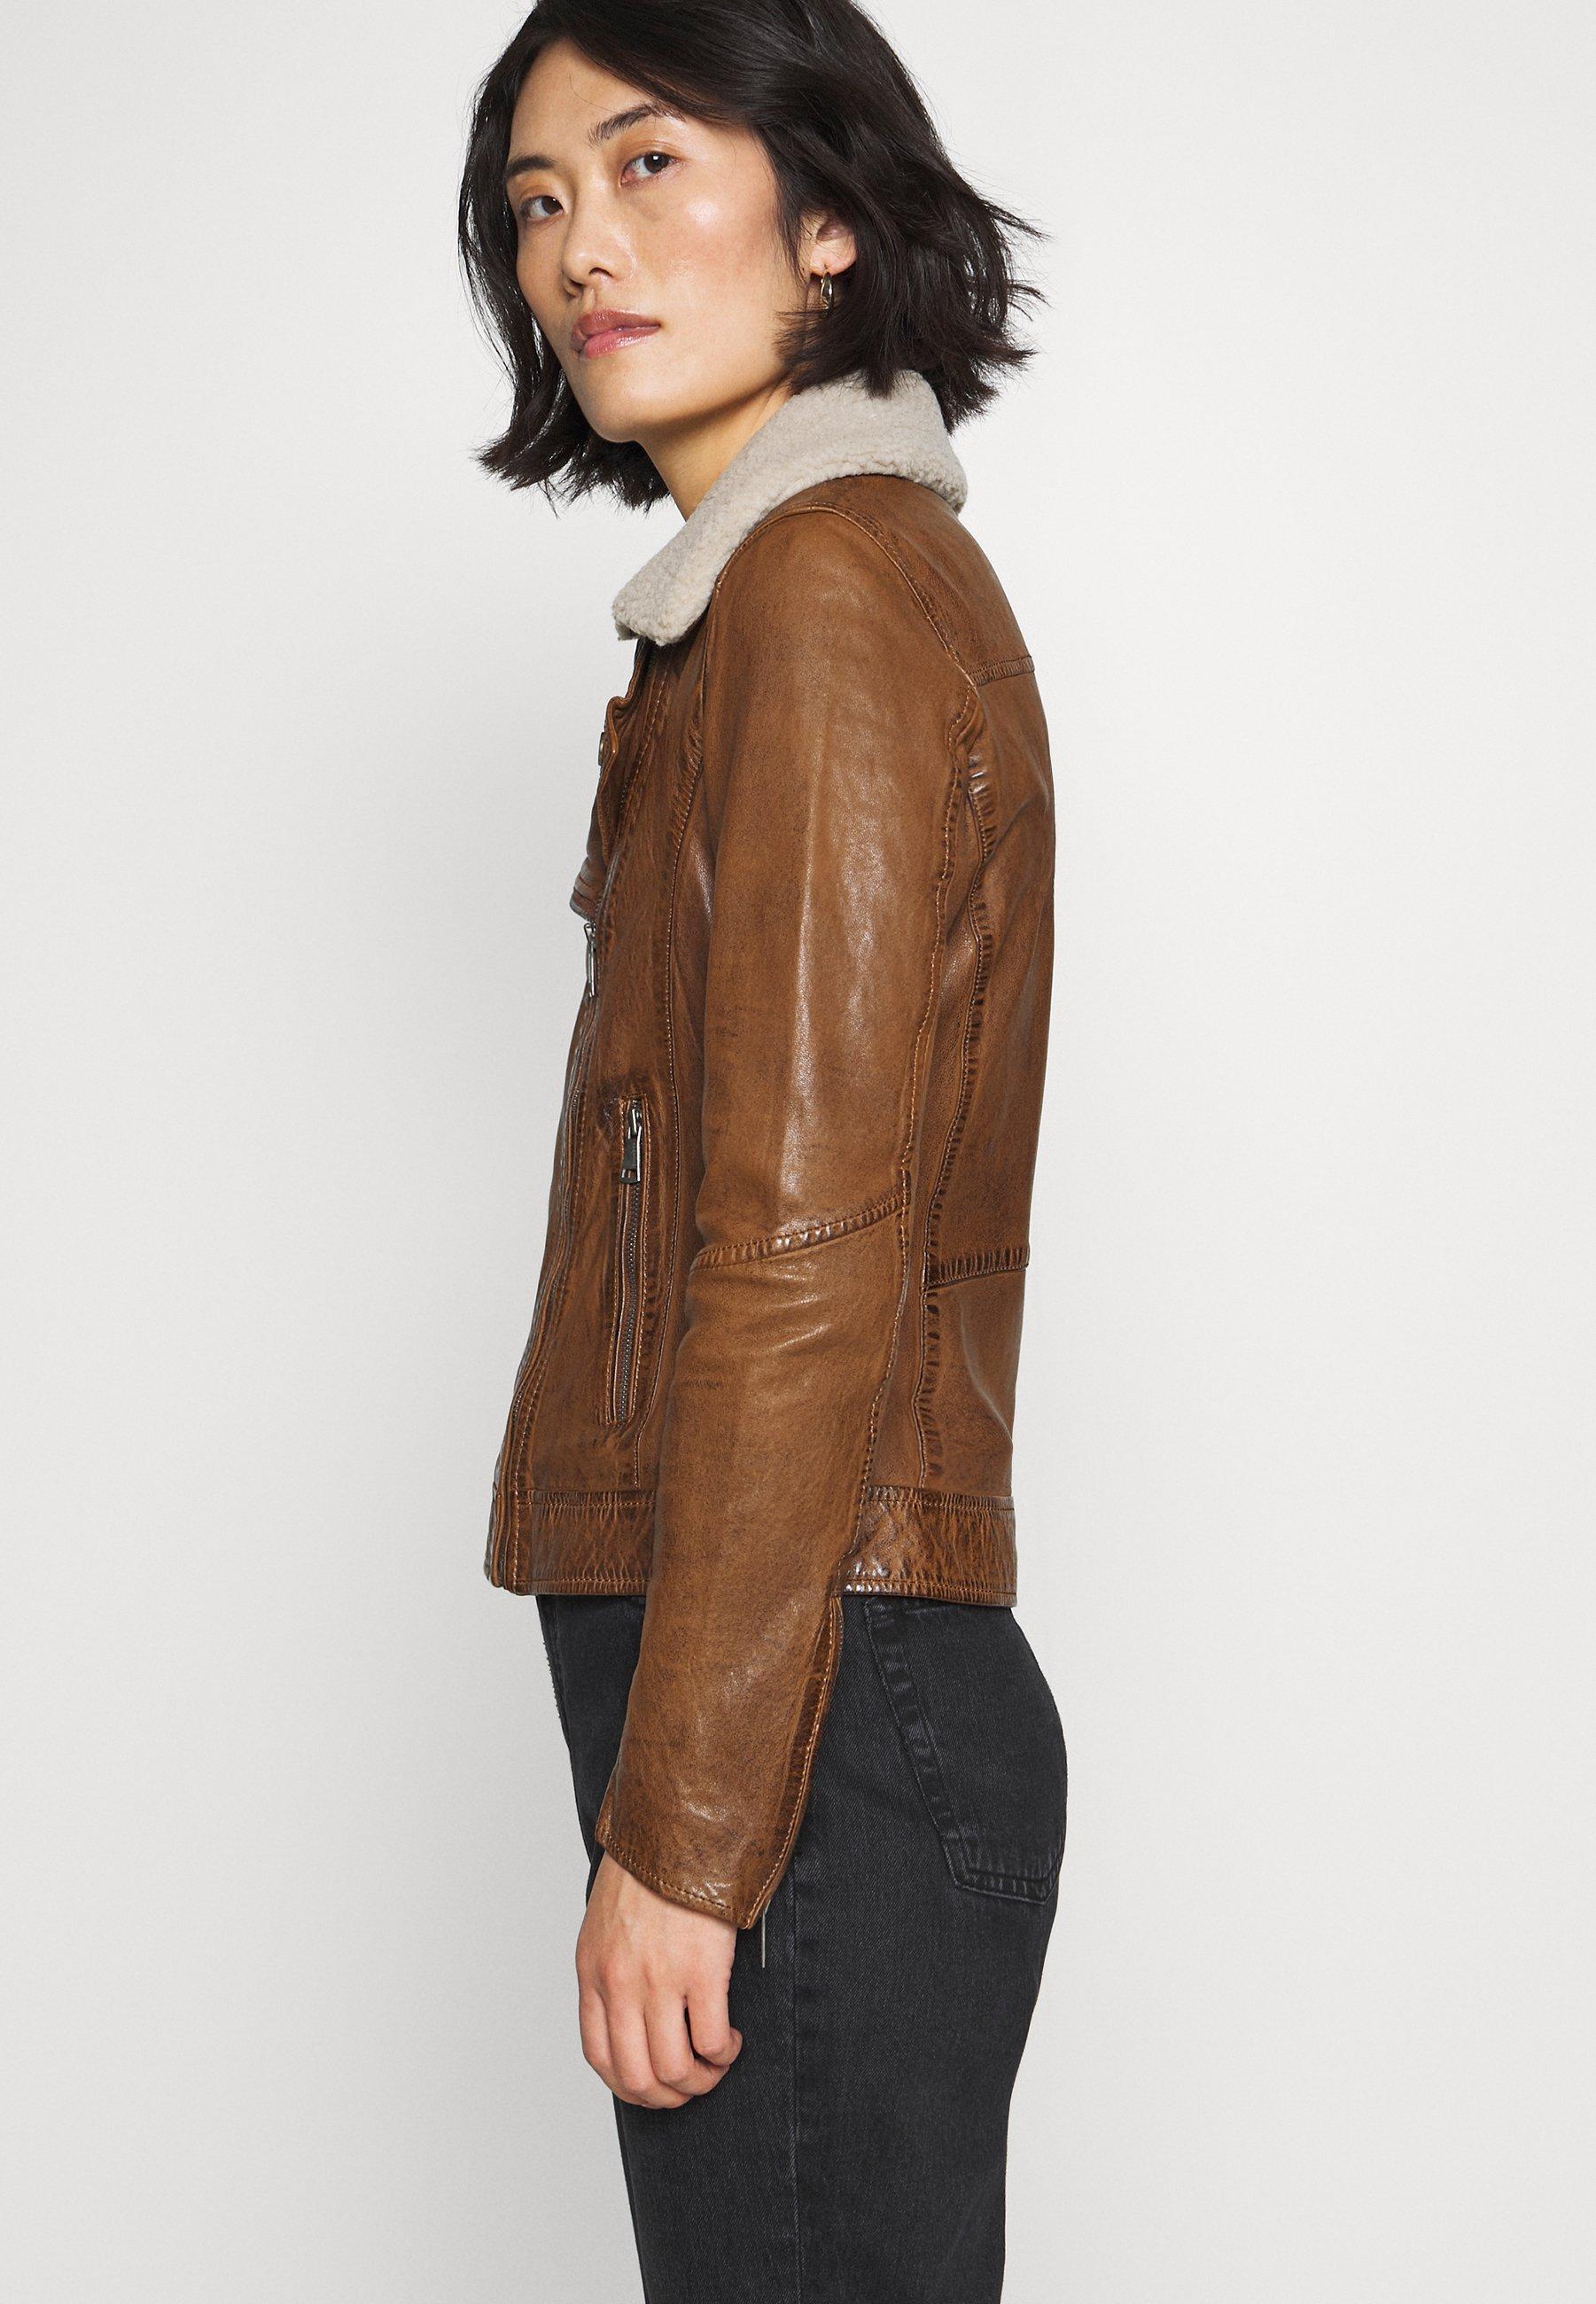 For Sale Women's Clothing Oakwood FOLLOWER Leather jacket tan QvvFM2qE6